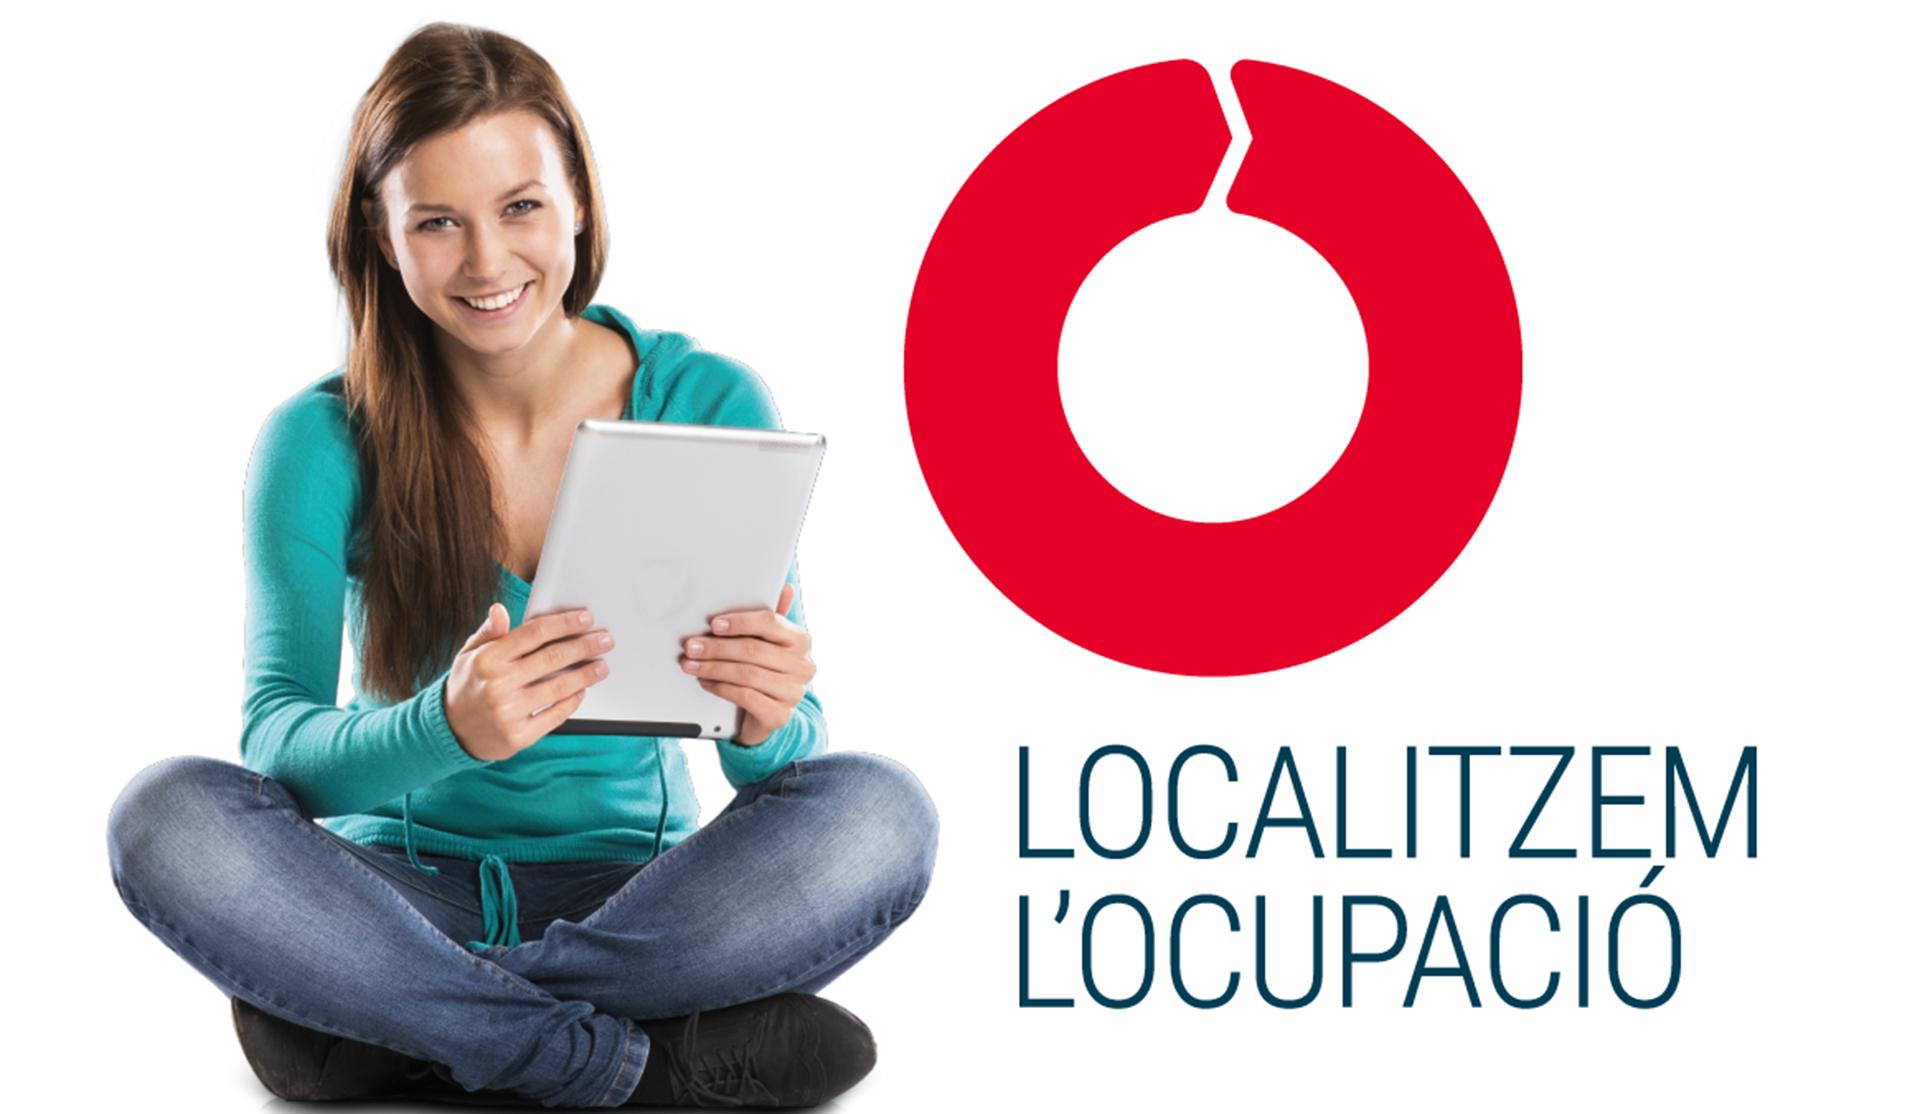 imagen corporativa chica con libreta logo Terrassa Ocupació